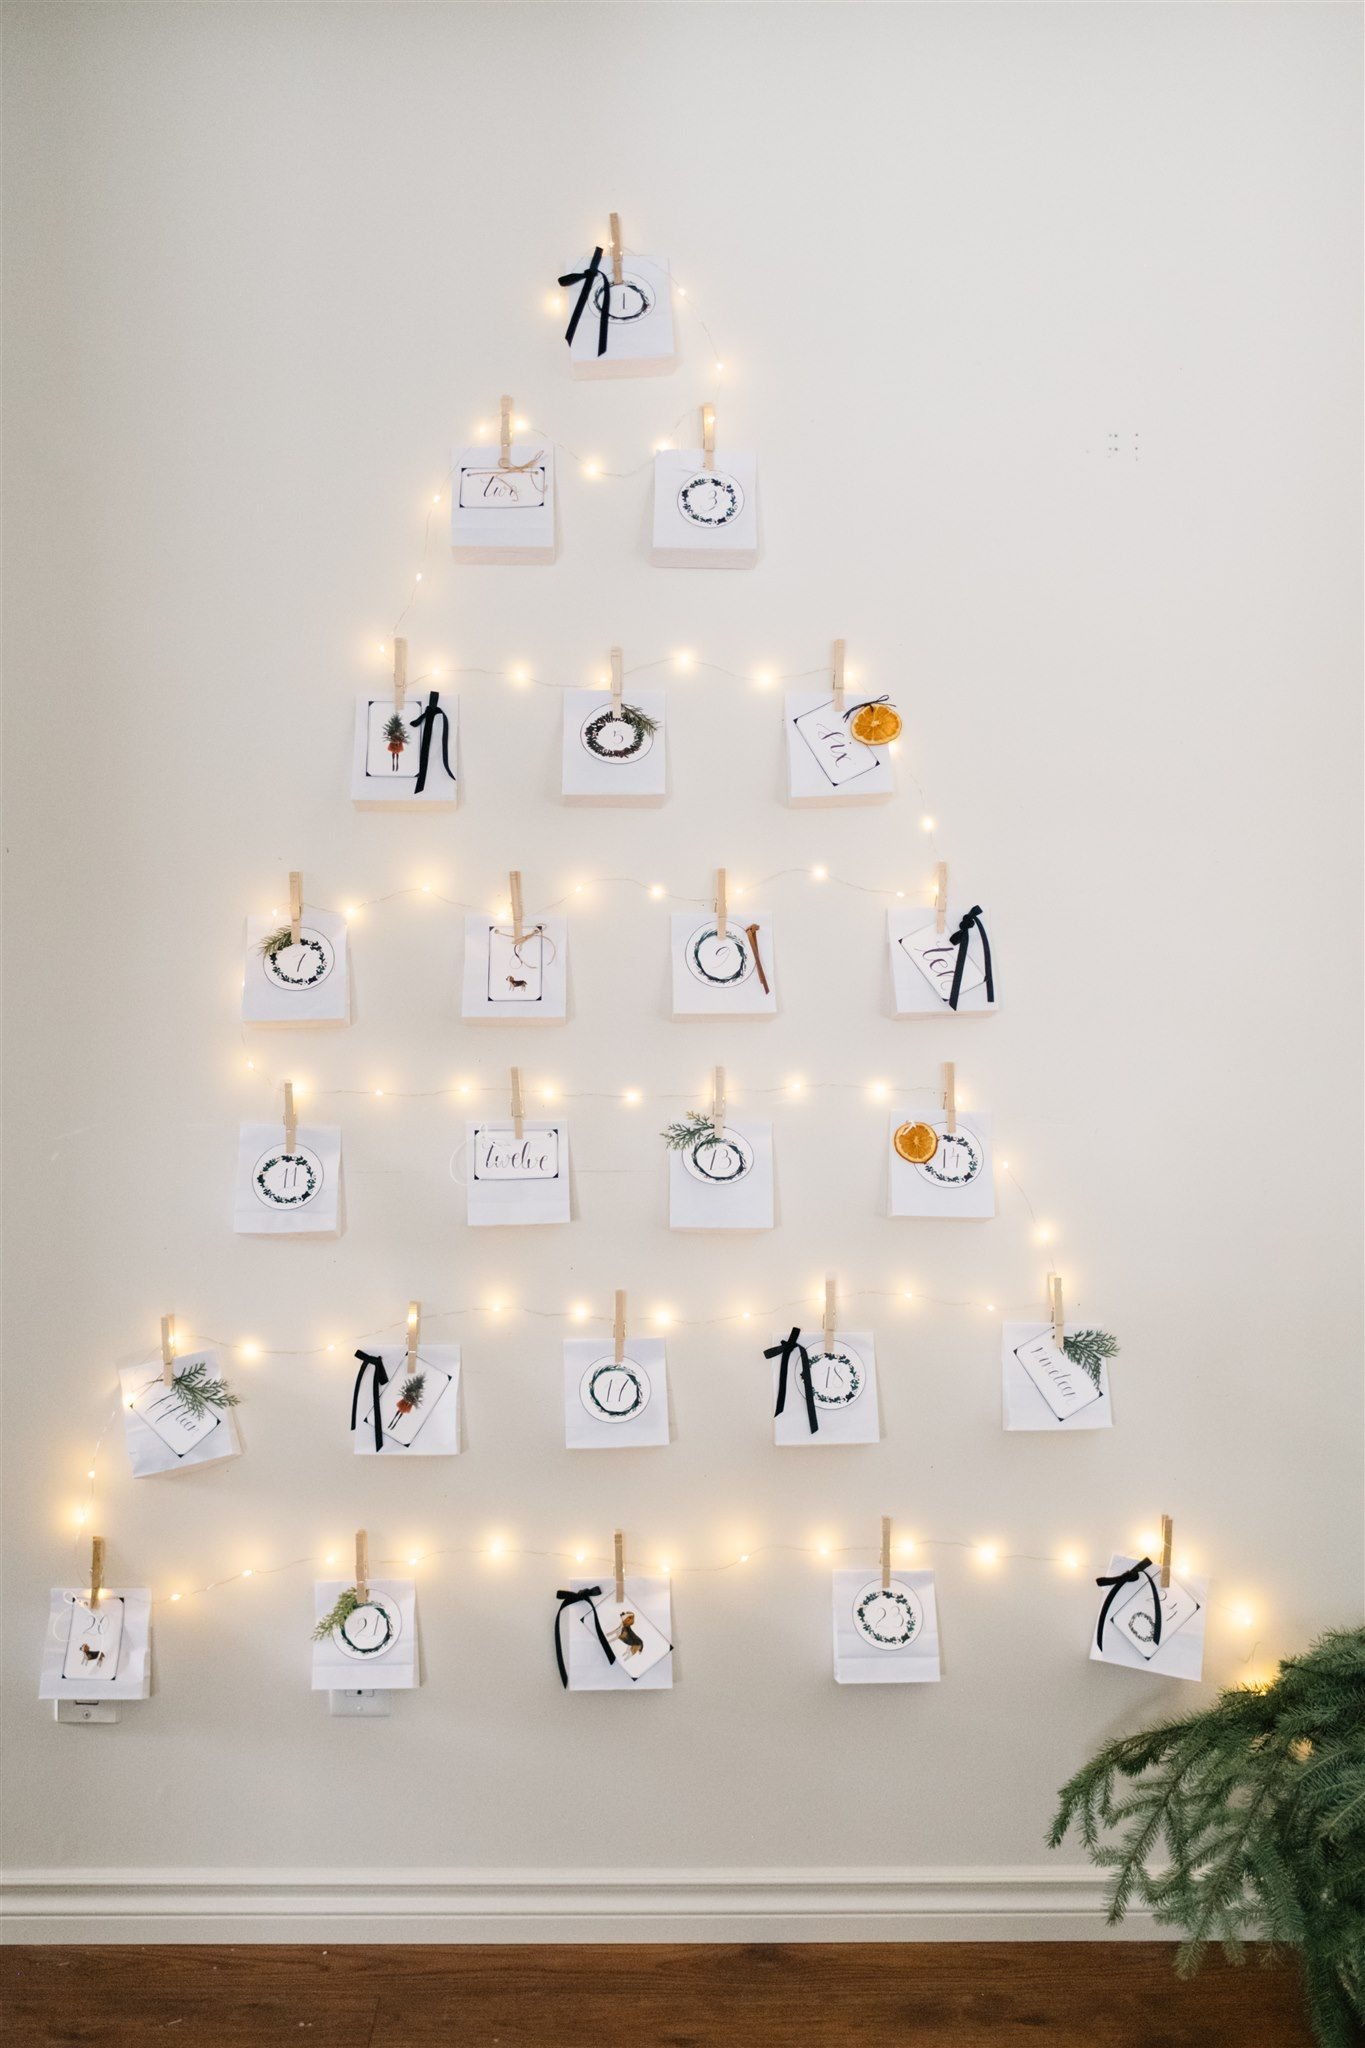 Diy Christmas Advent Calendar With Printable Tags The Ginger Home Christmas Advent Calendar Diy Christmas Advent Calendar Homemade Advent Calendars